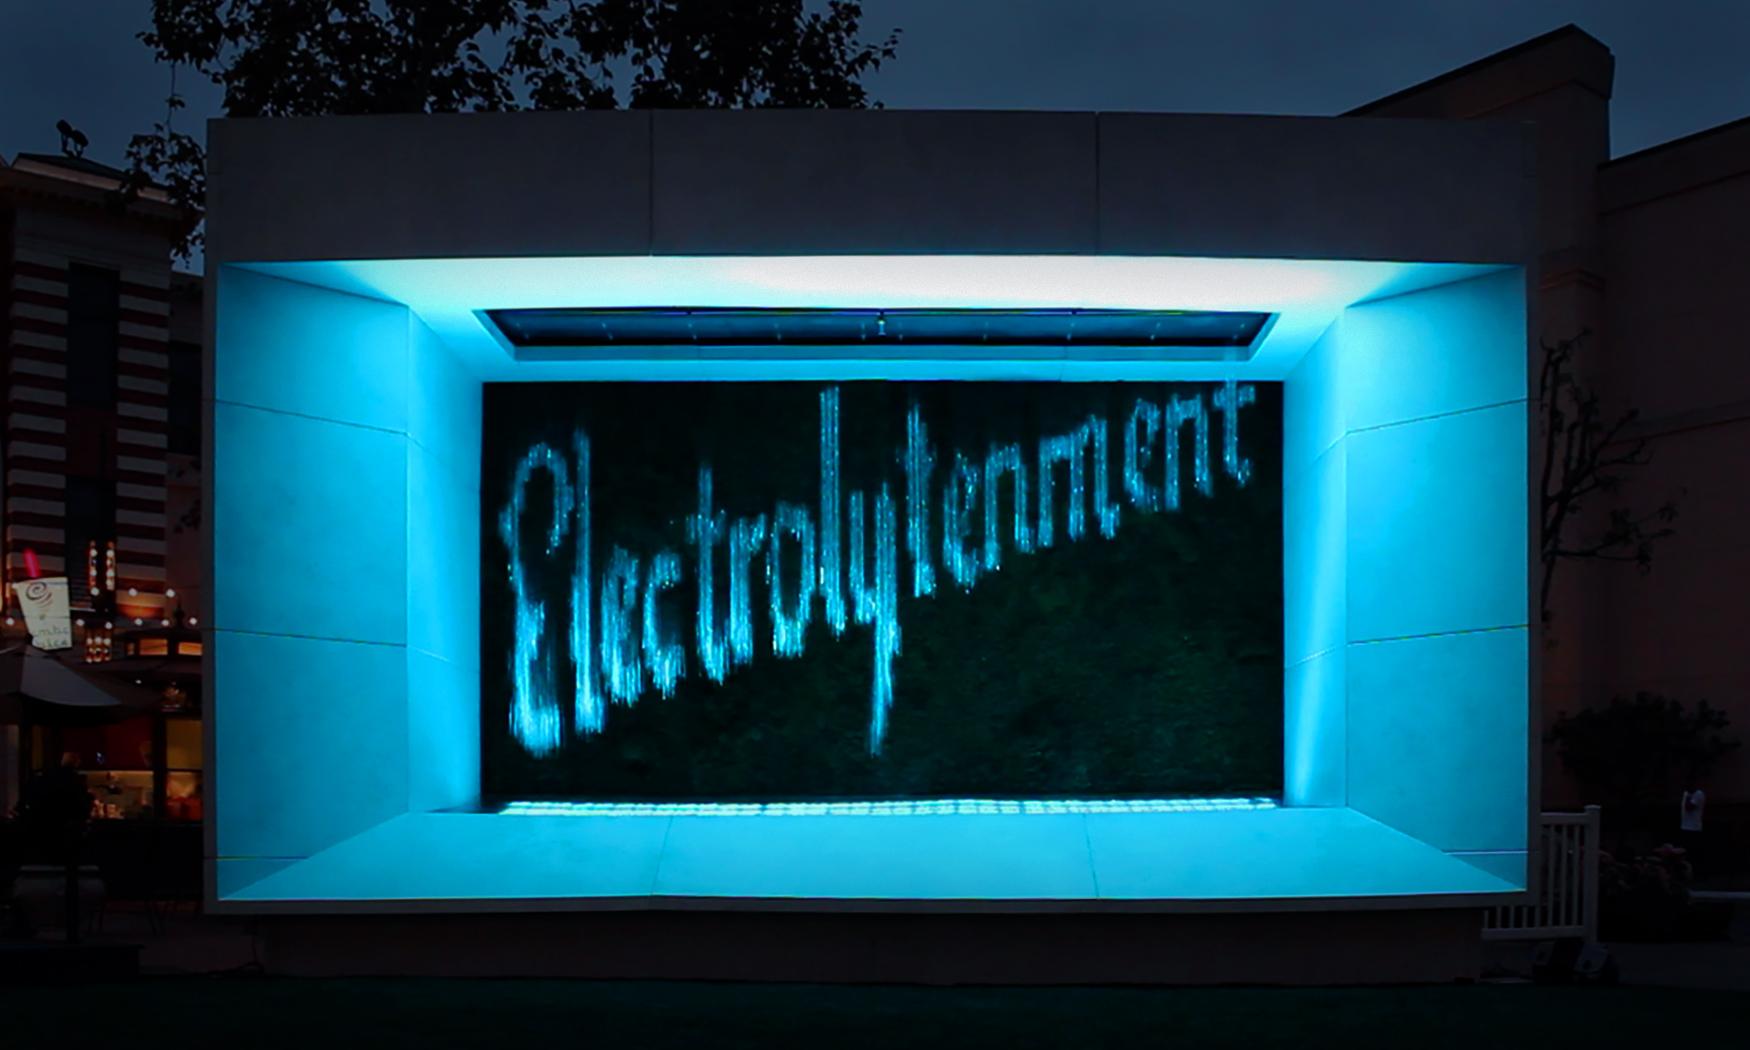 FOUNTAIN_Electrolytenment_HERO1.jpg